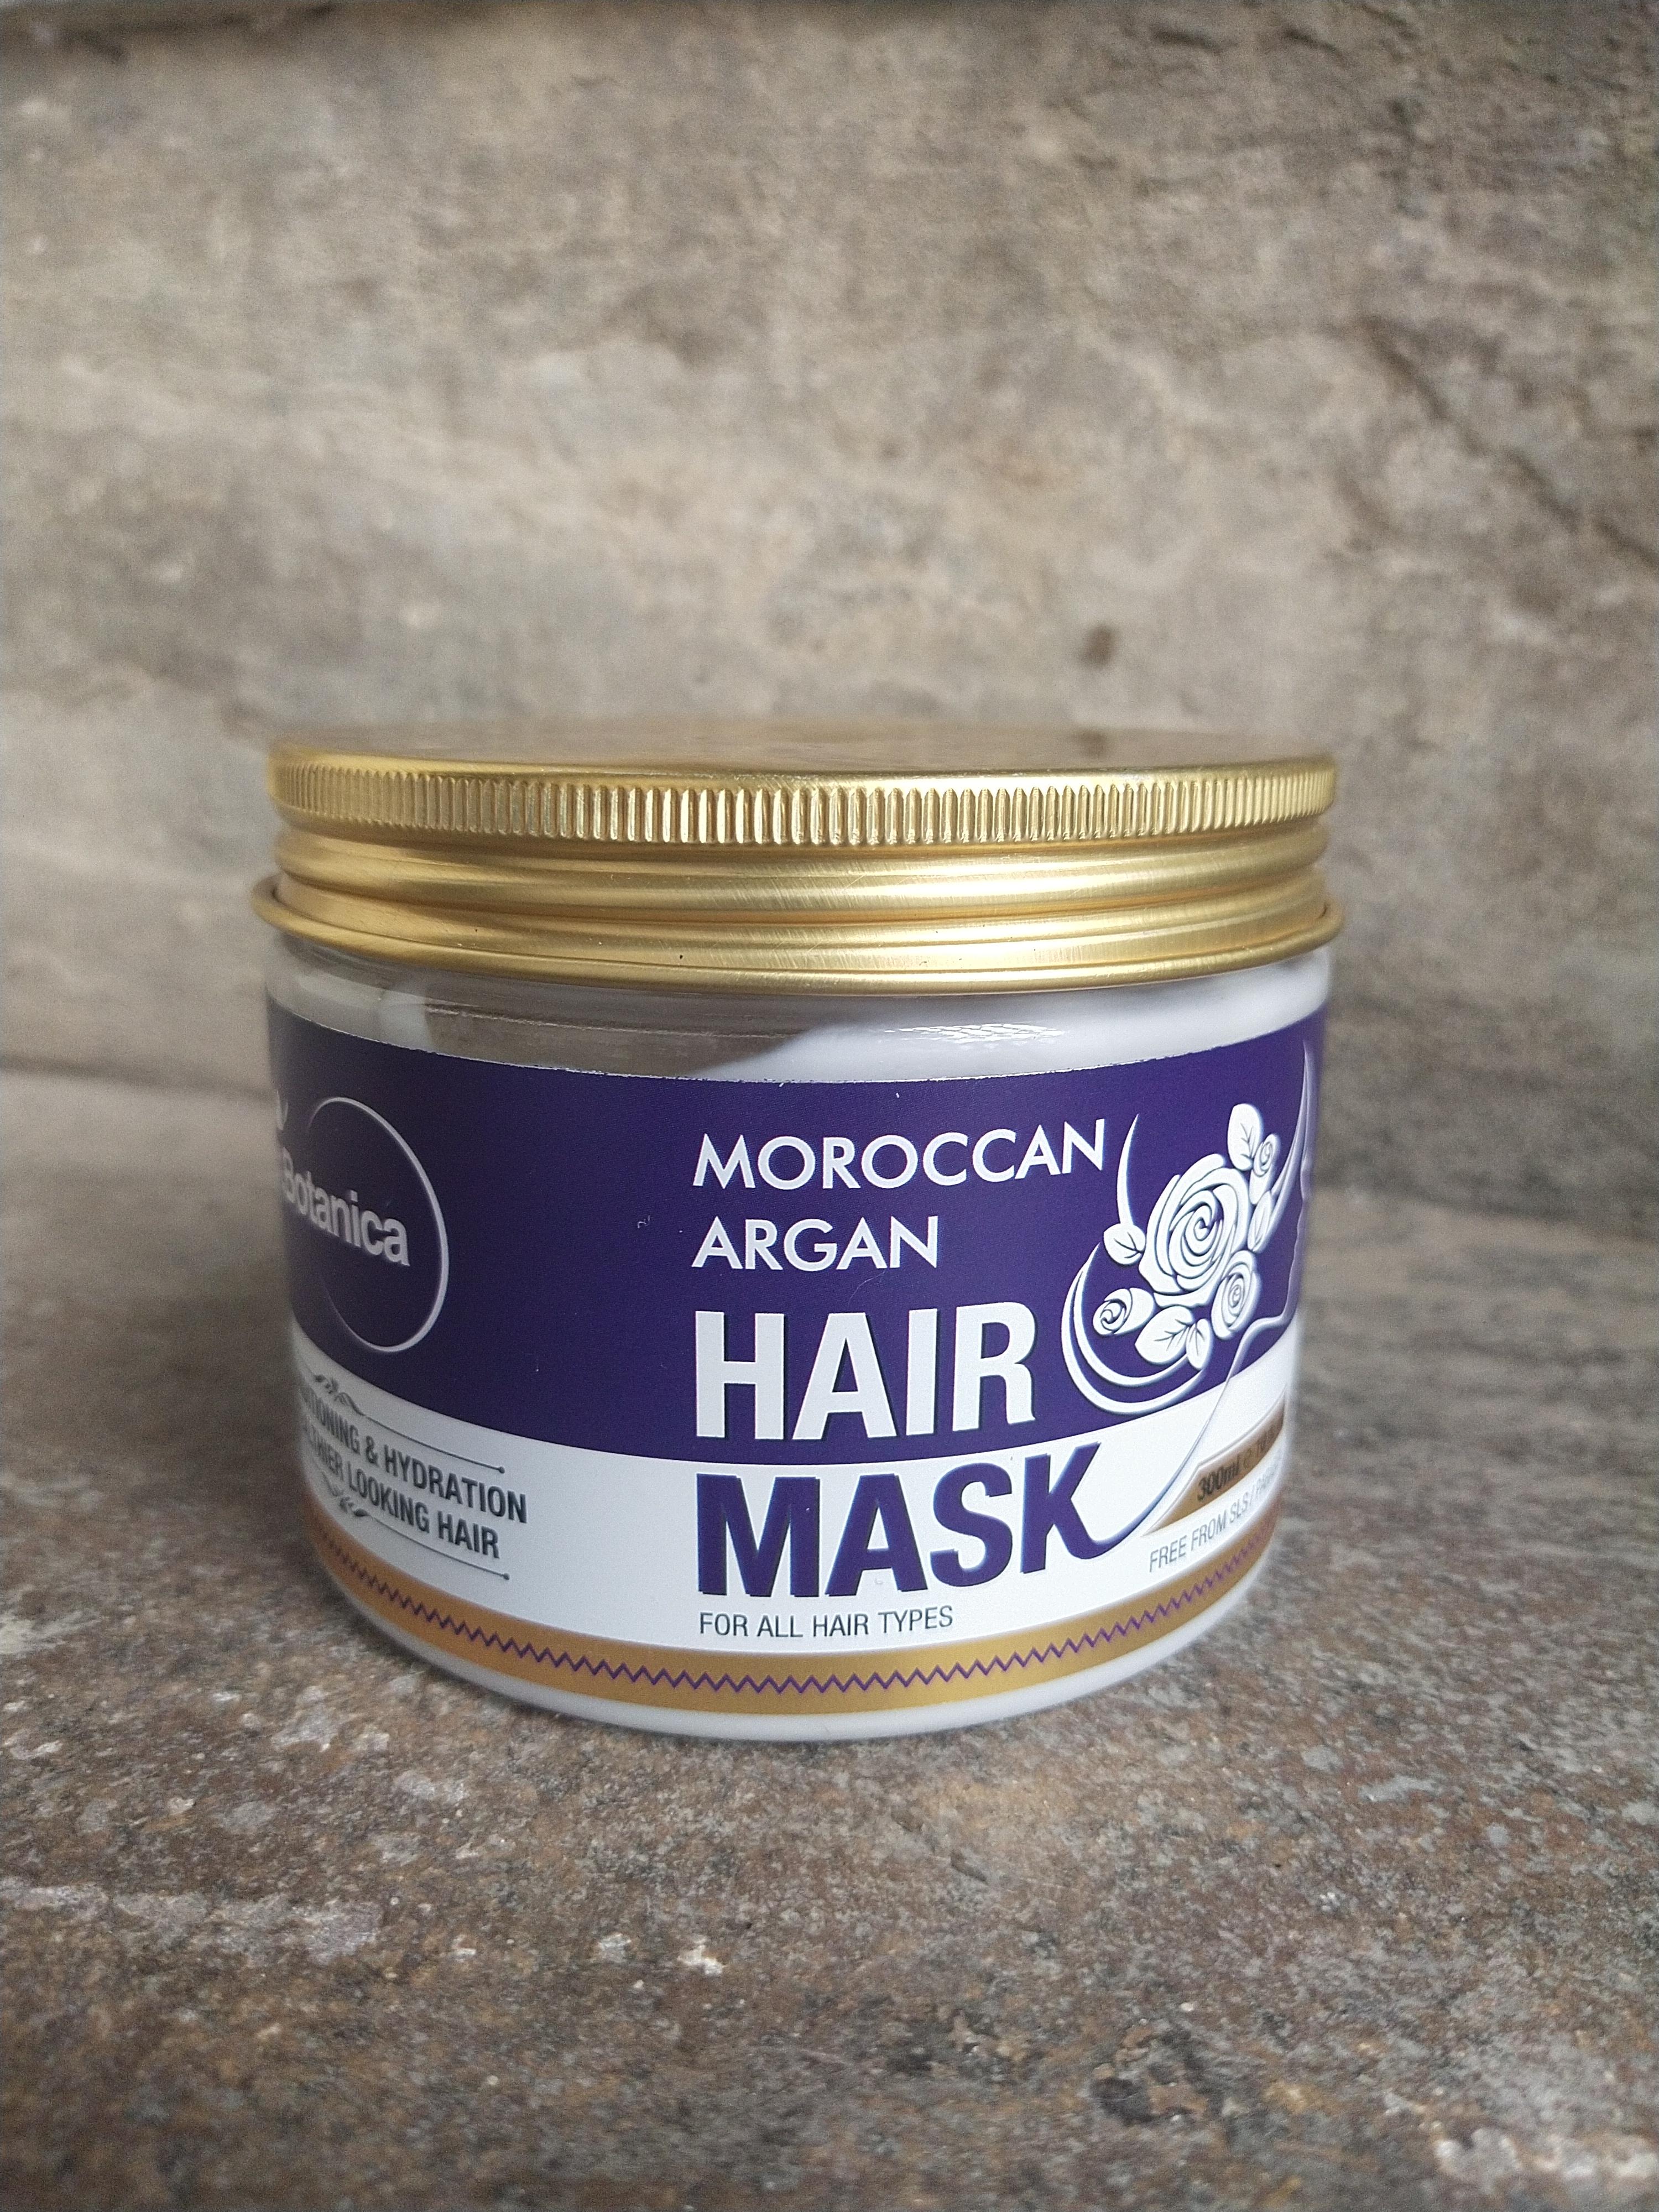 St.Botanica Moroccan Argan Hair Mask-Healthy hair-By agrawaalpriyanka